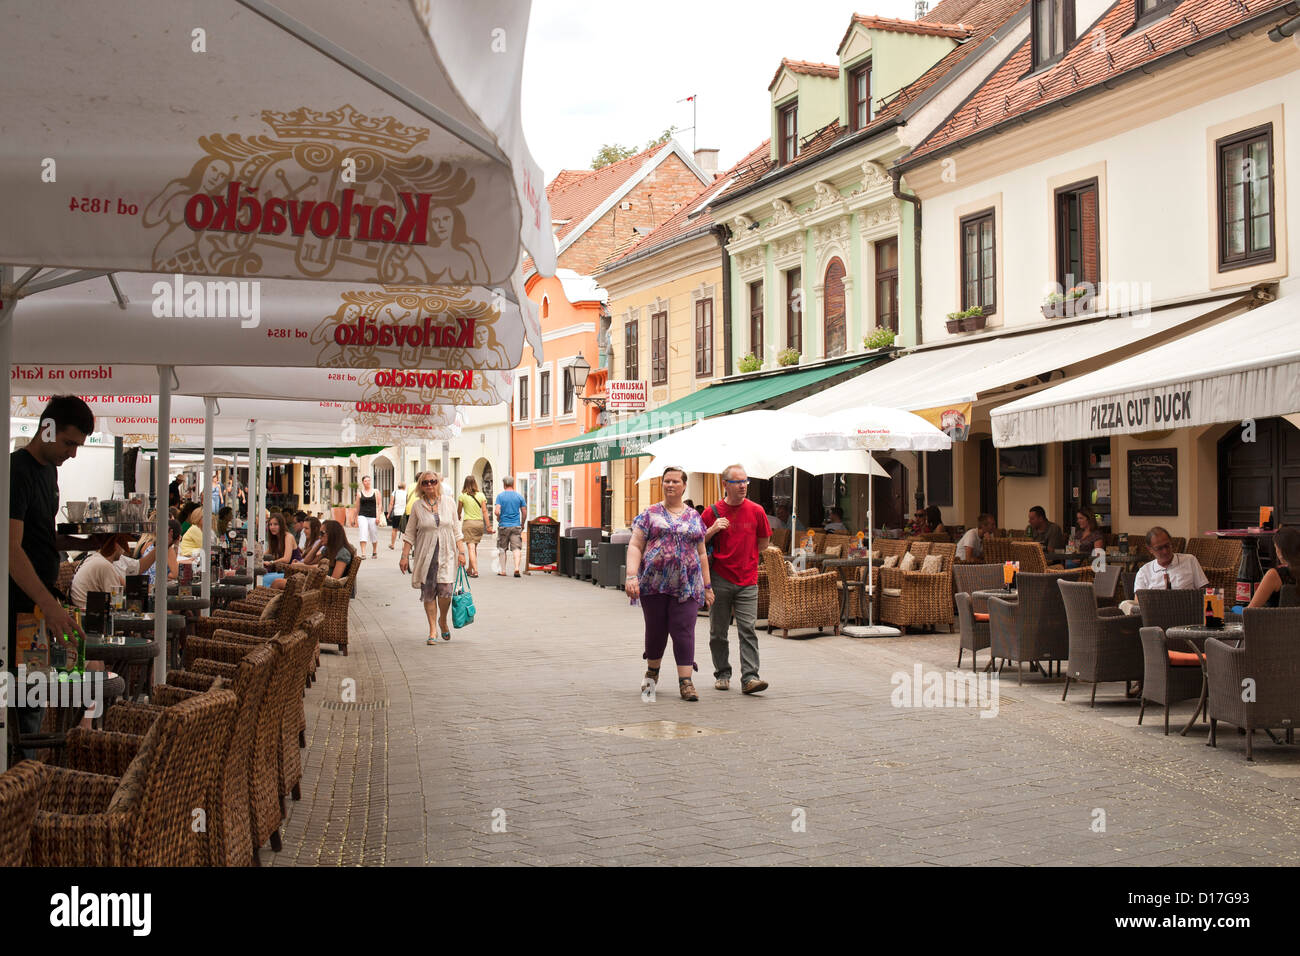 Cafes on Tkalciceva street in Zagreb, the capital of Croatia. Stock Photo